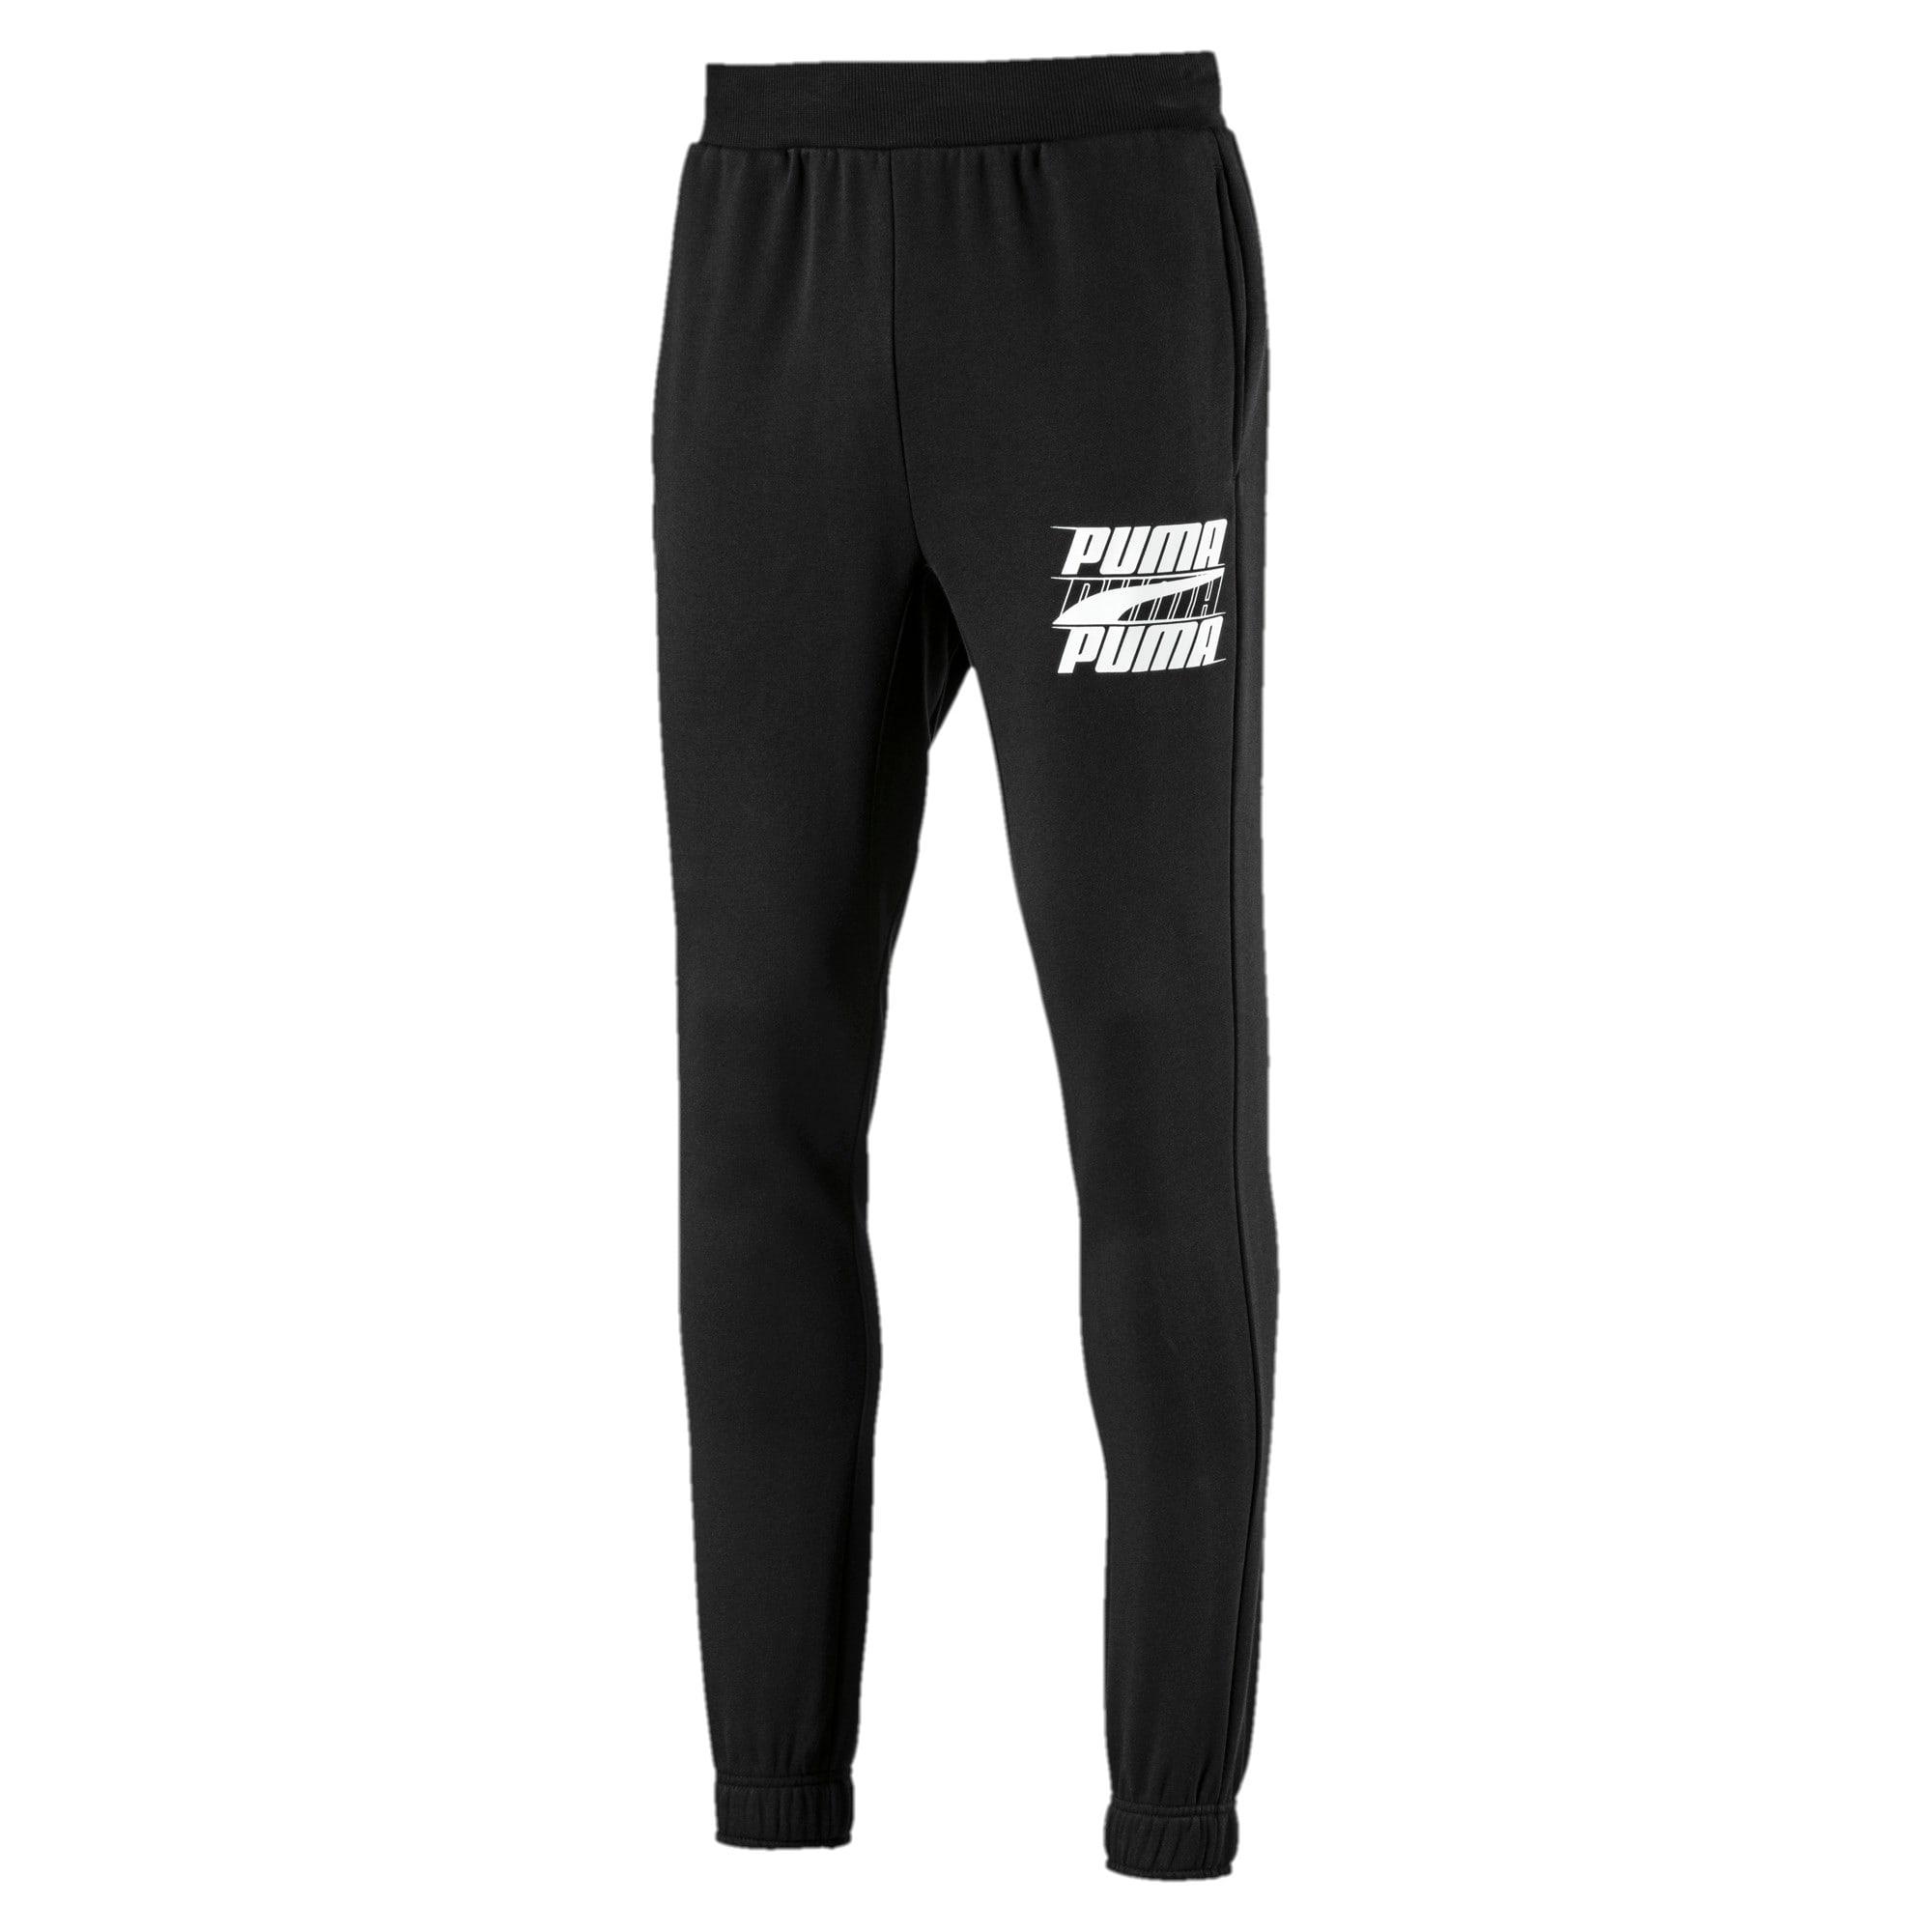 Thumbnail 1 of Rebel Bold Pants, Cotton Black, medium